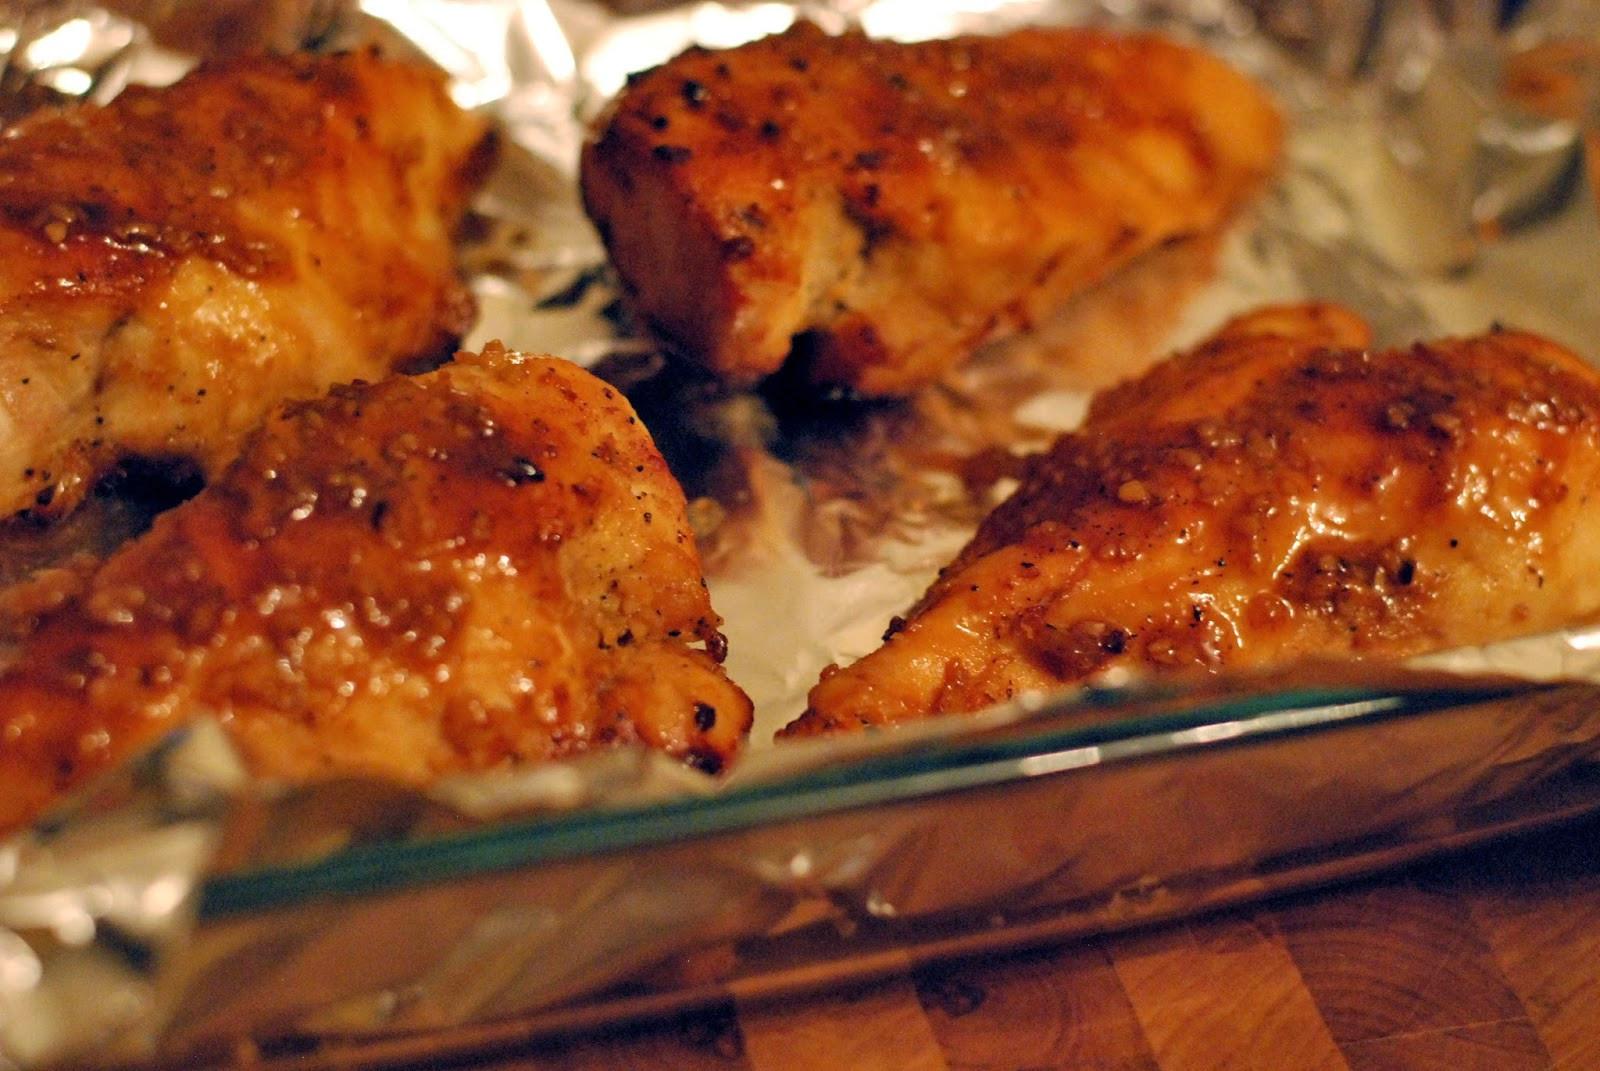 Best Baked Chicken Recipe  The World s Best Baked Chicken Aunt Bee s Recipes